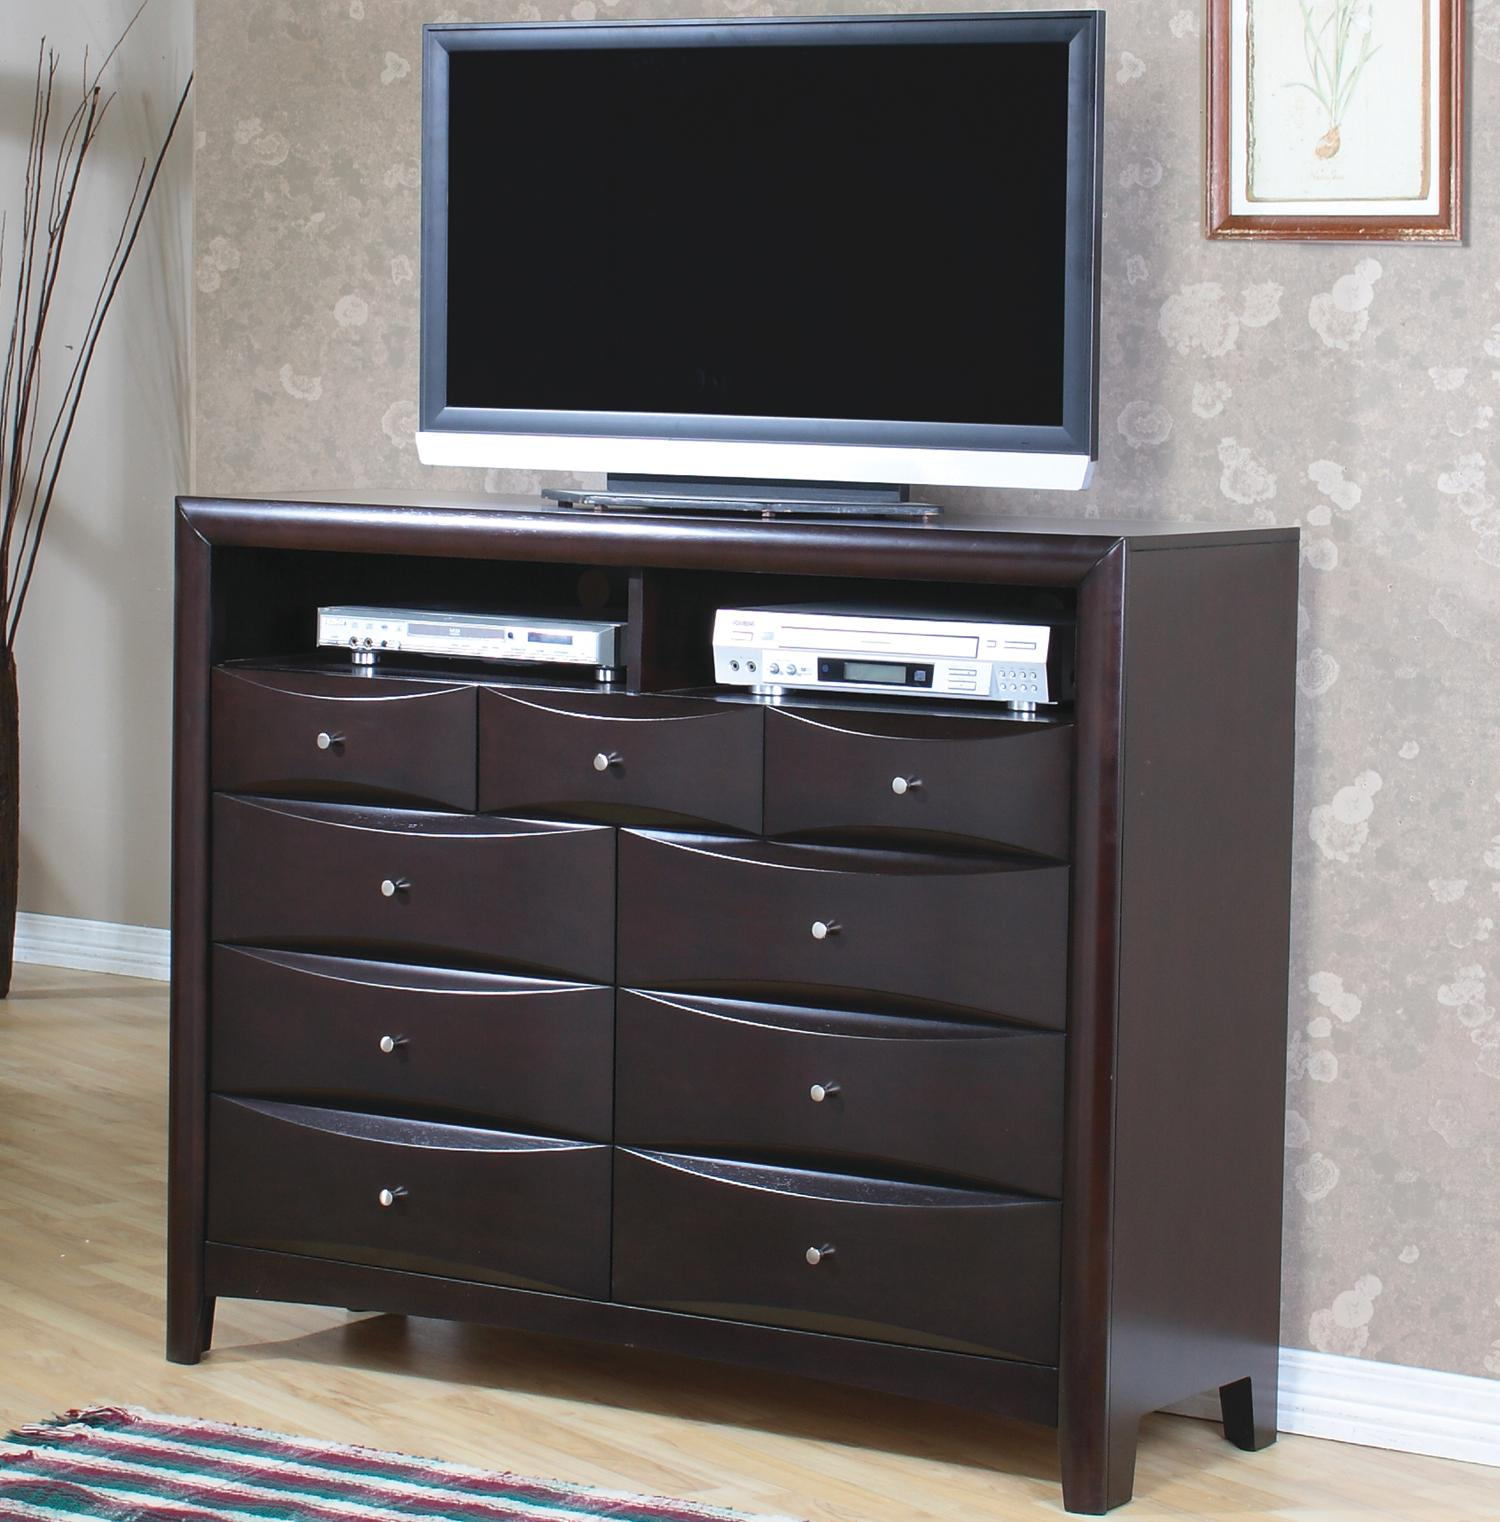 https://broadwayfurniture.net/wp-content/uploads/Phoenix-Storage-Bookcase-Bed-6-Piece-Bedroom-Set-in-Rich-Deep-Cappuccino-Finish-by-Coaster.jpg